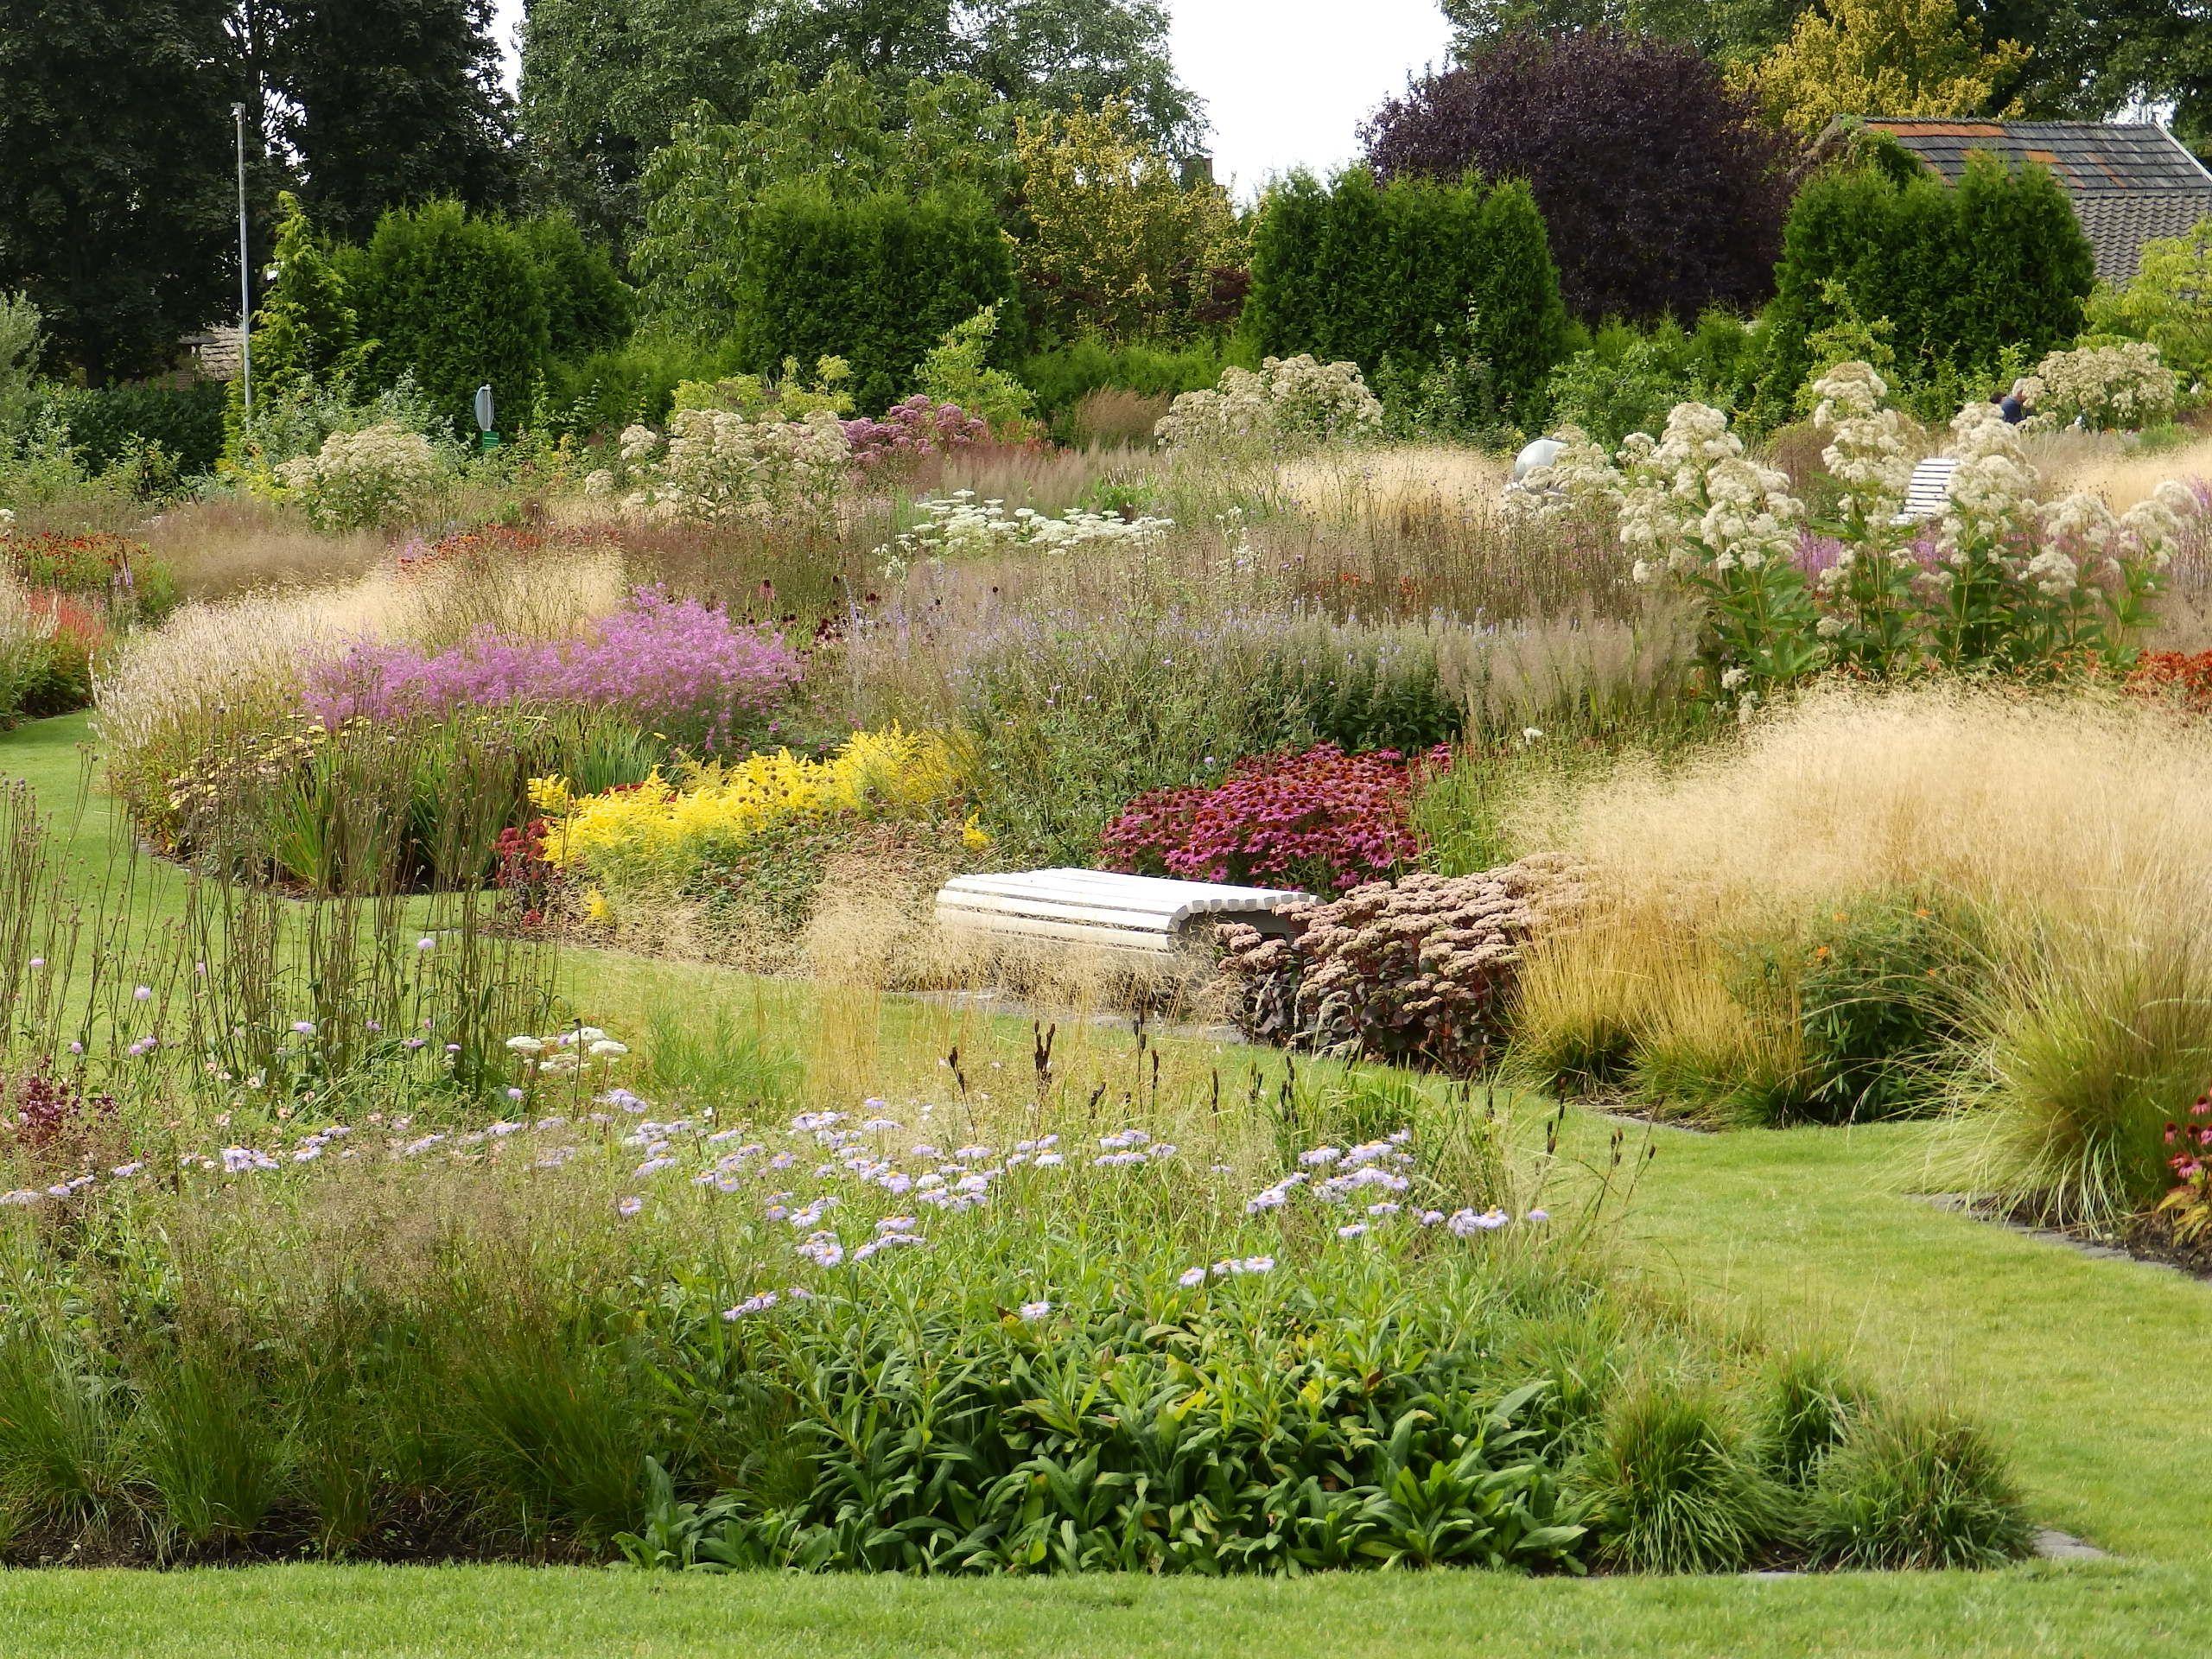 Vlinderhof maximapark ontwerper piet oudolf garden for Designing with plants oudolf